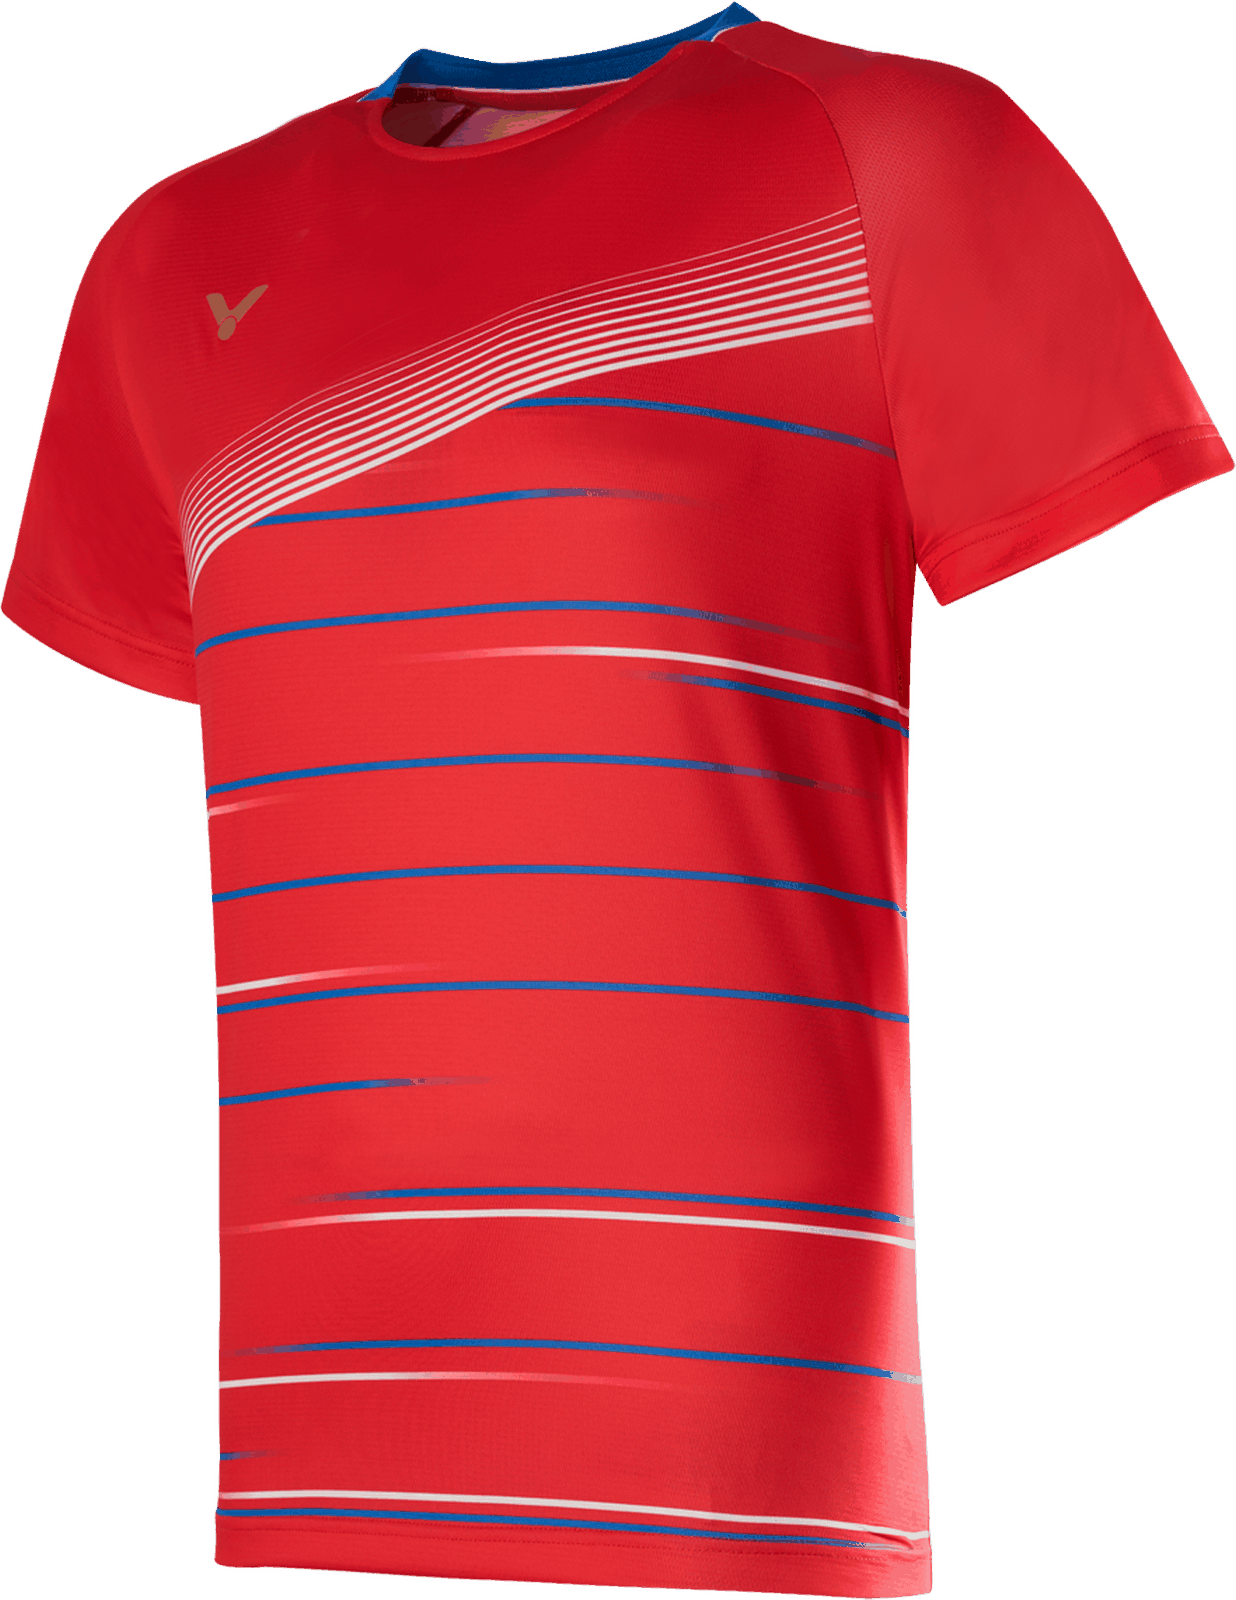 VICTOR T-Shirt T-00003 D